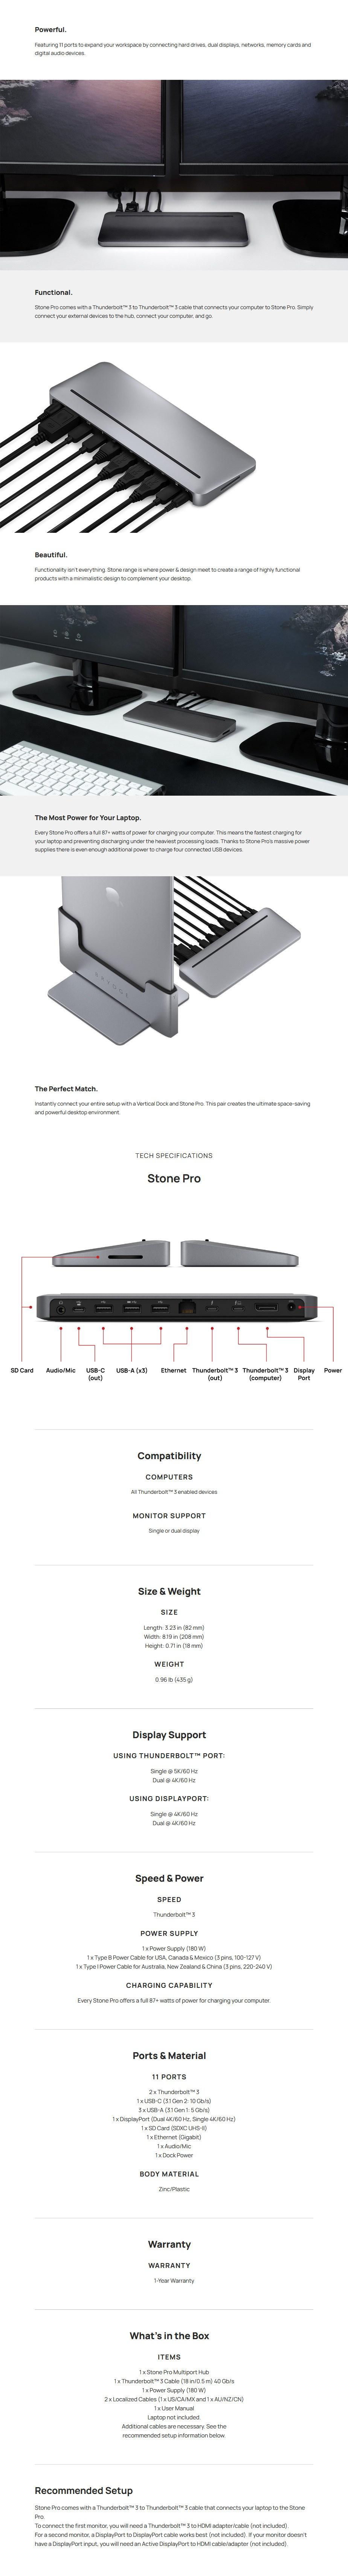 Brydge Stone Pro Thunderbolt 3 Multi-Port Desktop Hub - For Mac and Windows - Overview 1